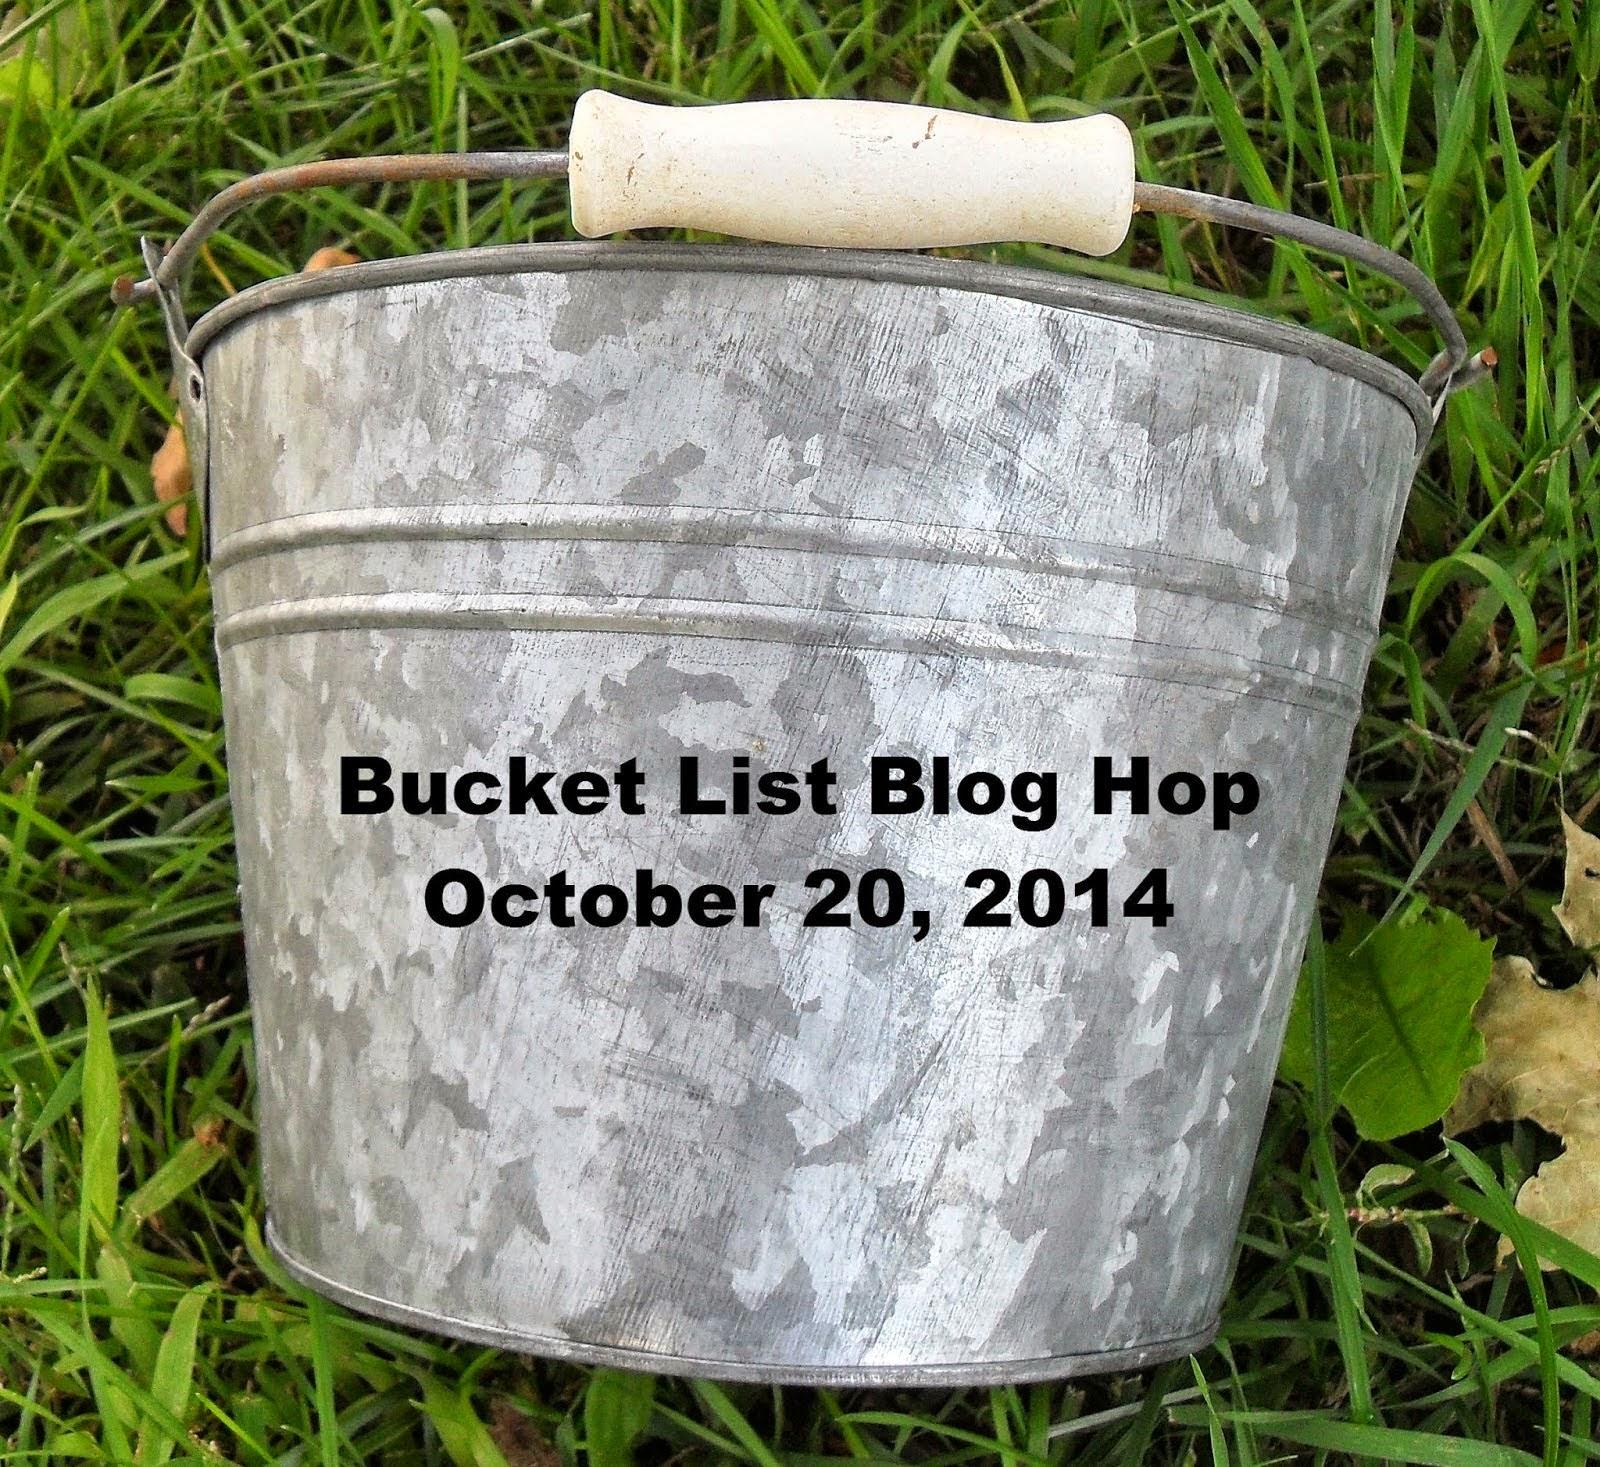 Bucket List Blog Hop